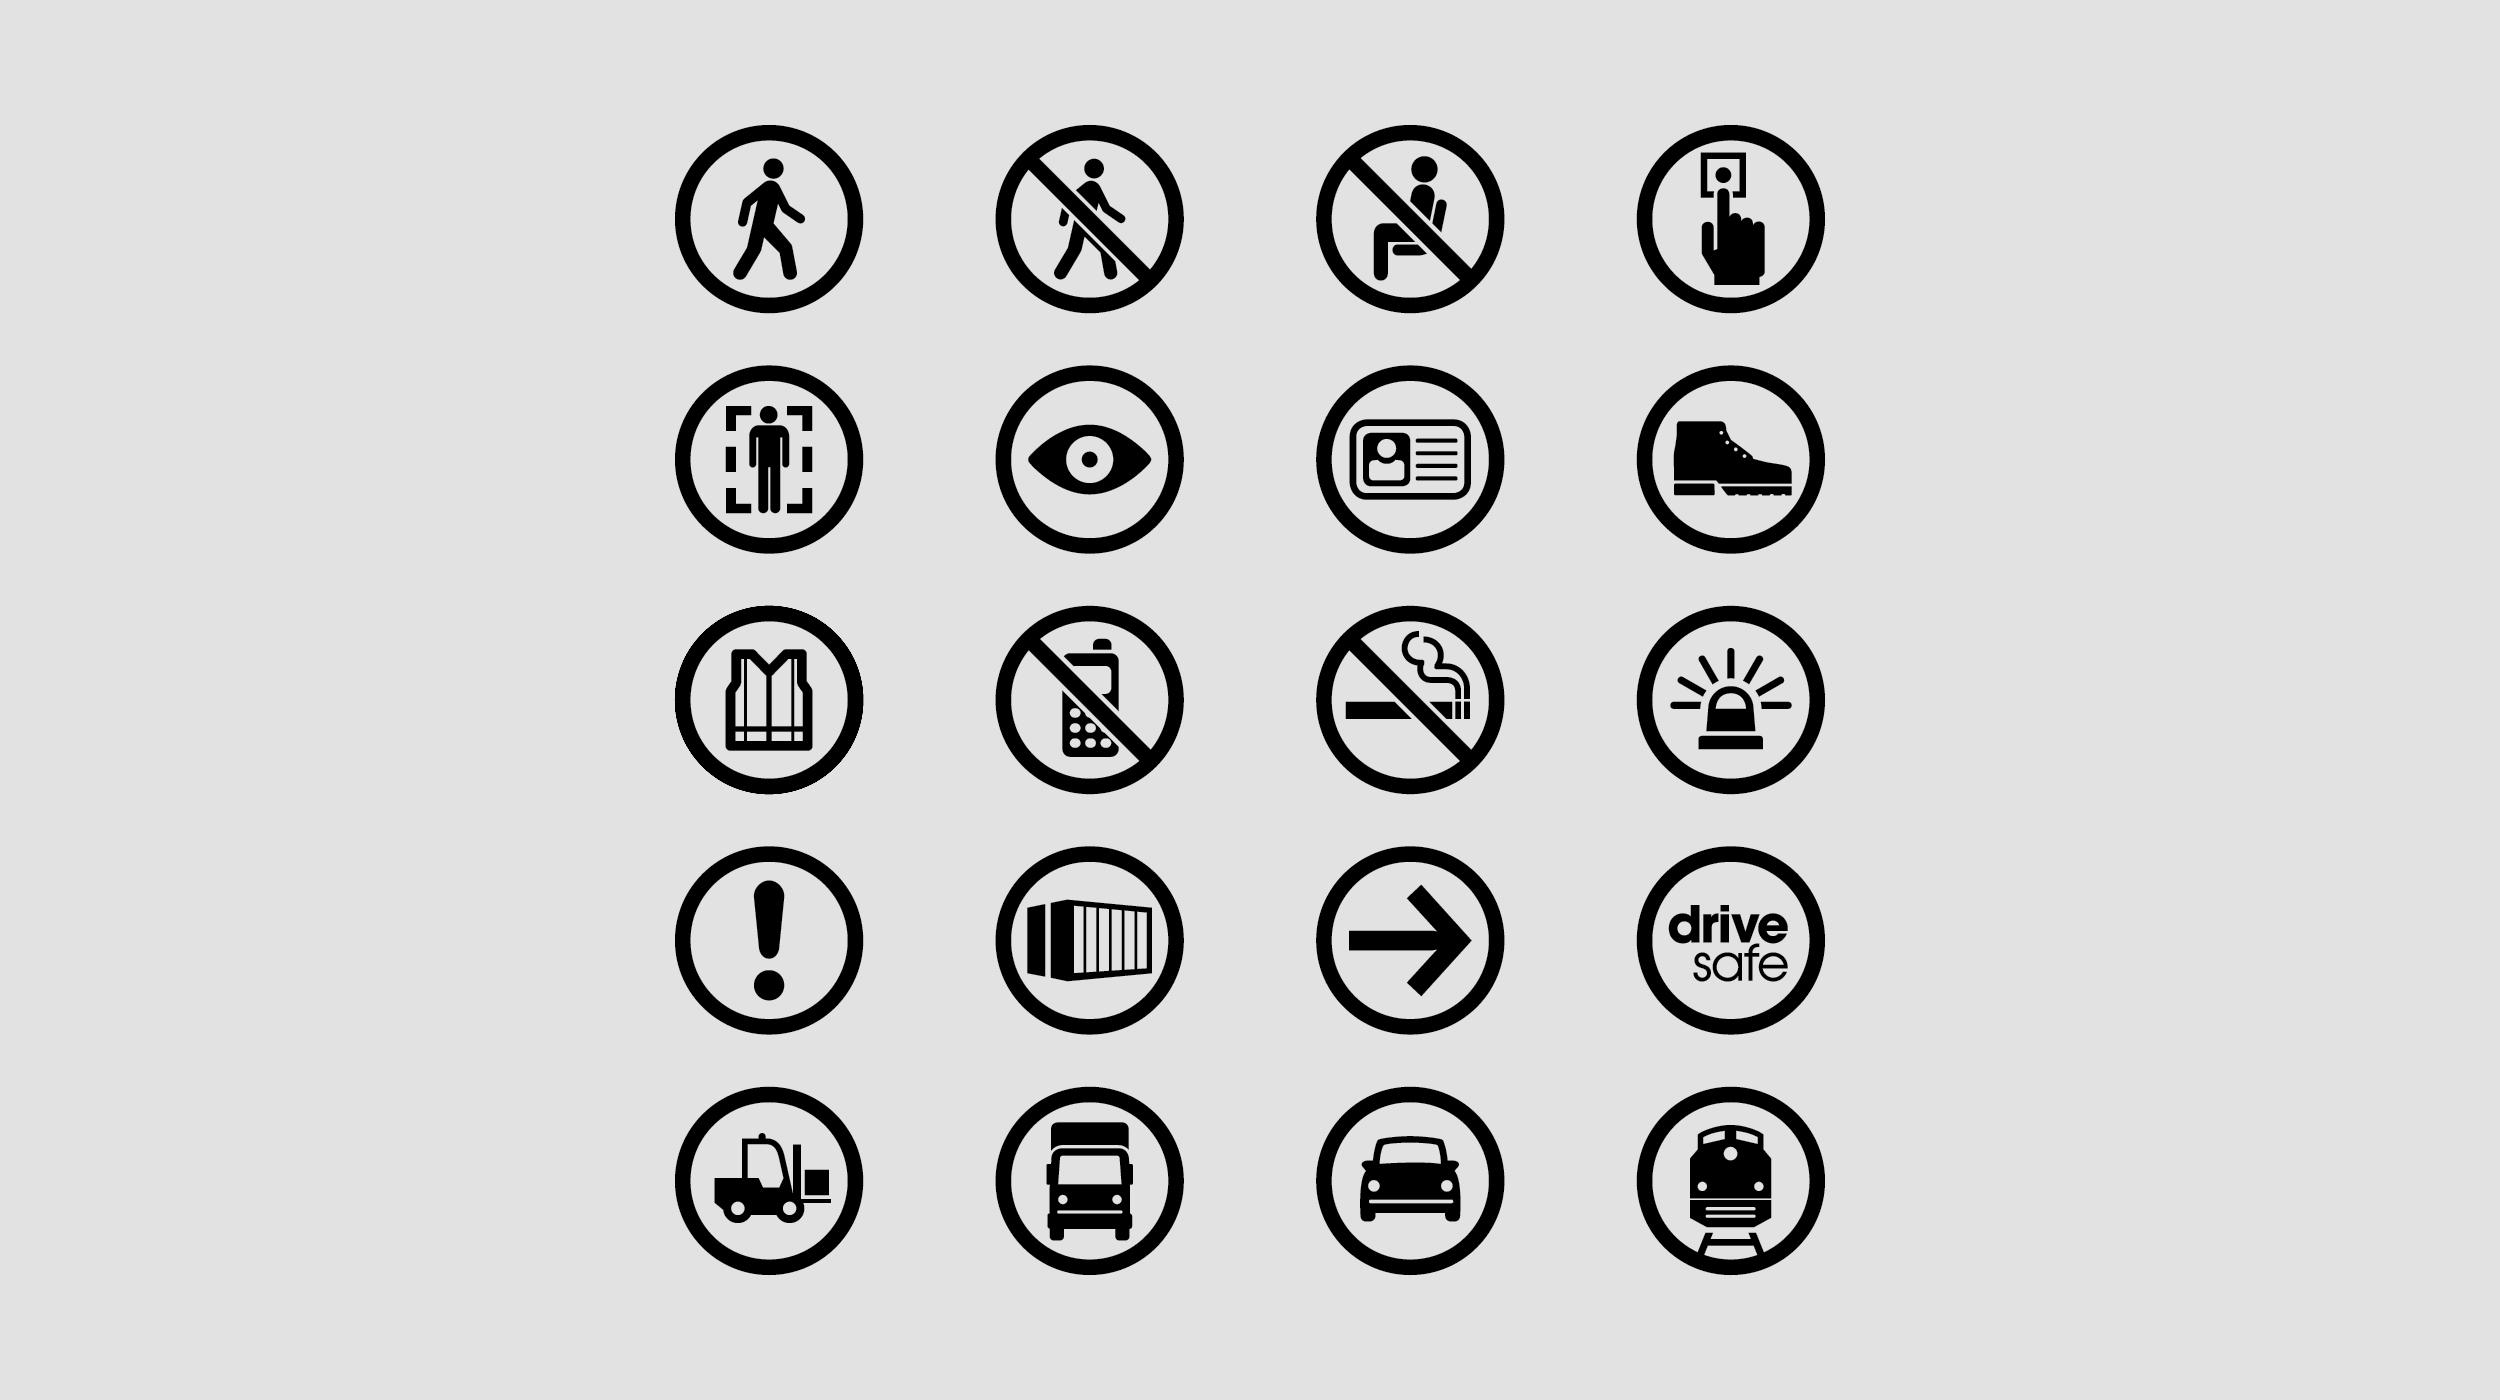 CentrePort Case Study Images_20185.jpg